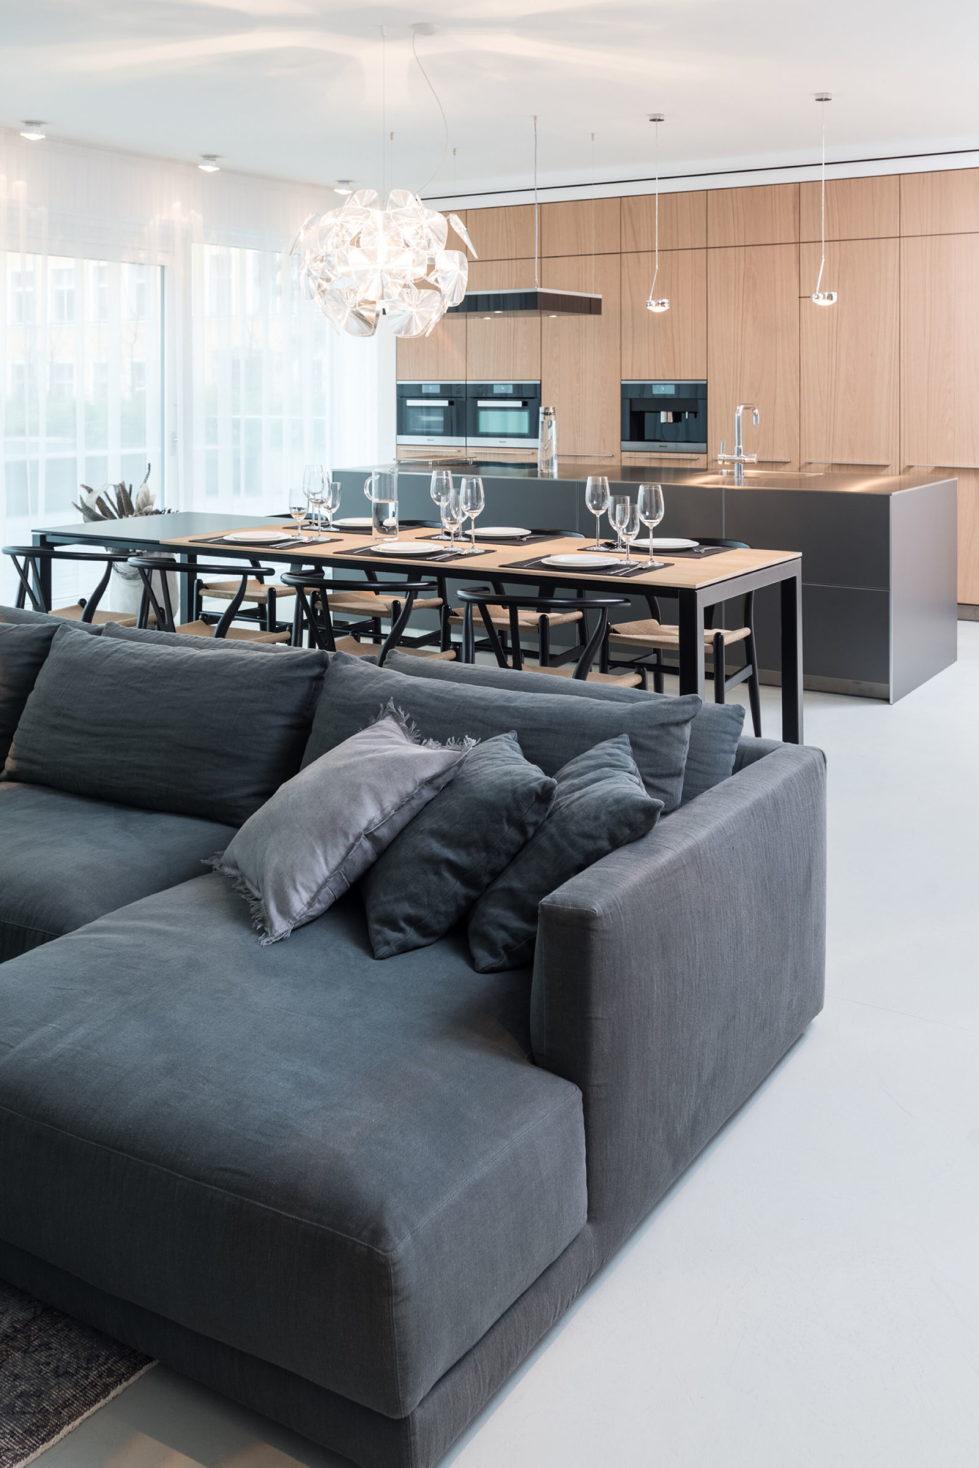 12 Lofts In Prague From OOOOX Studio 10